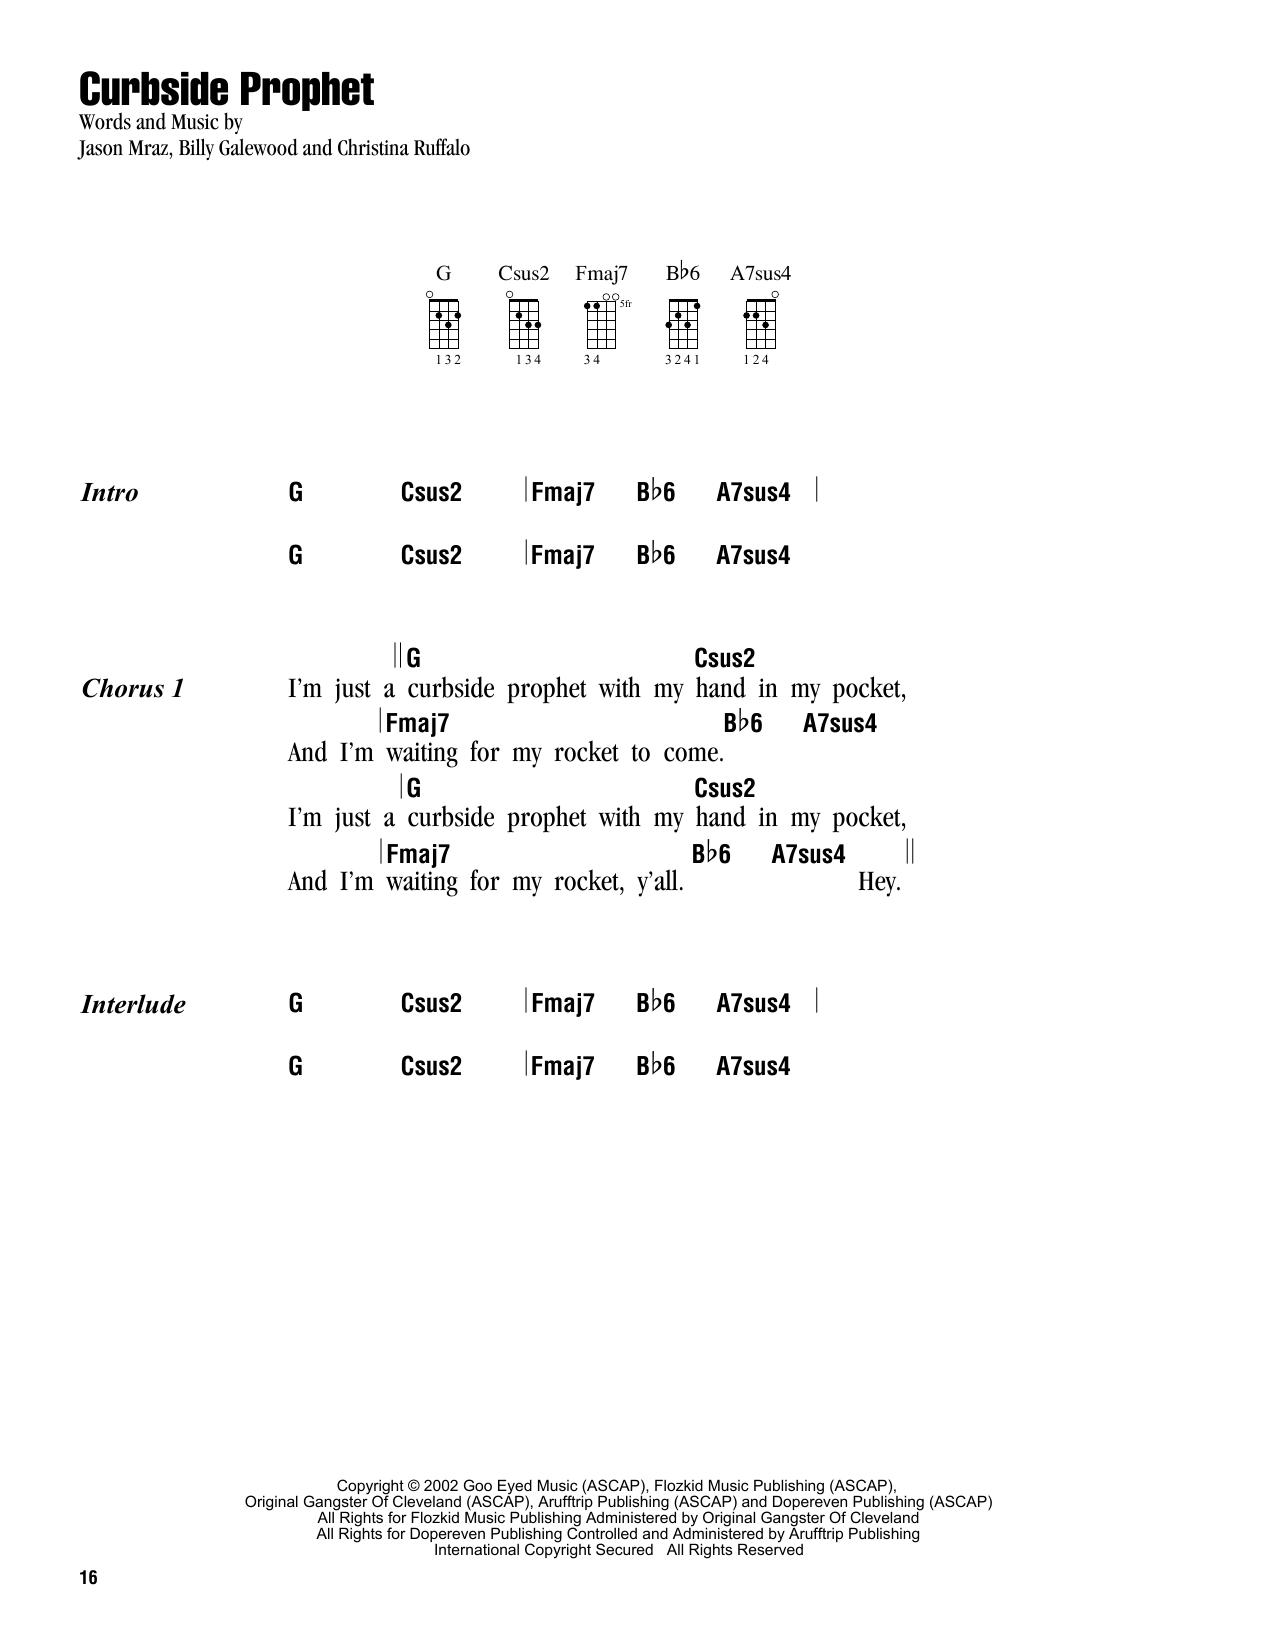 Tablature guitare Curbside Prophet de Jason Mraz - Ukulele (strumming patterns)